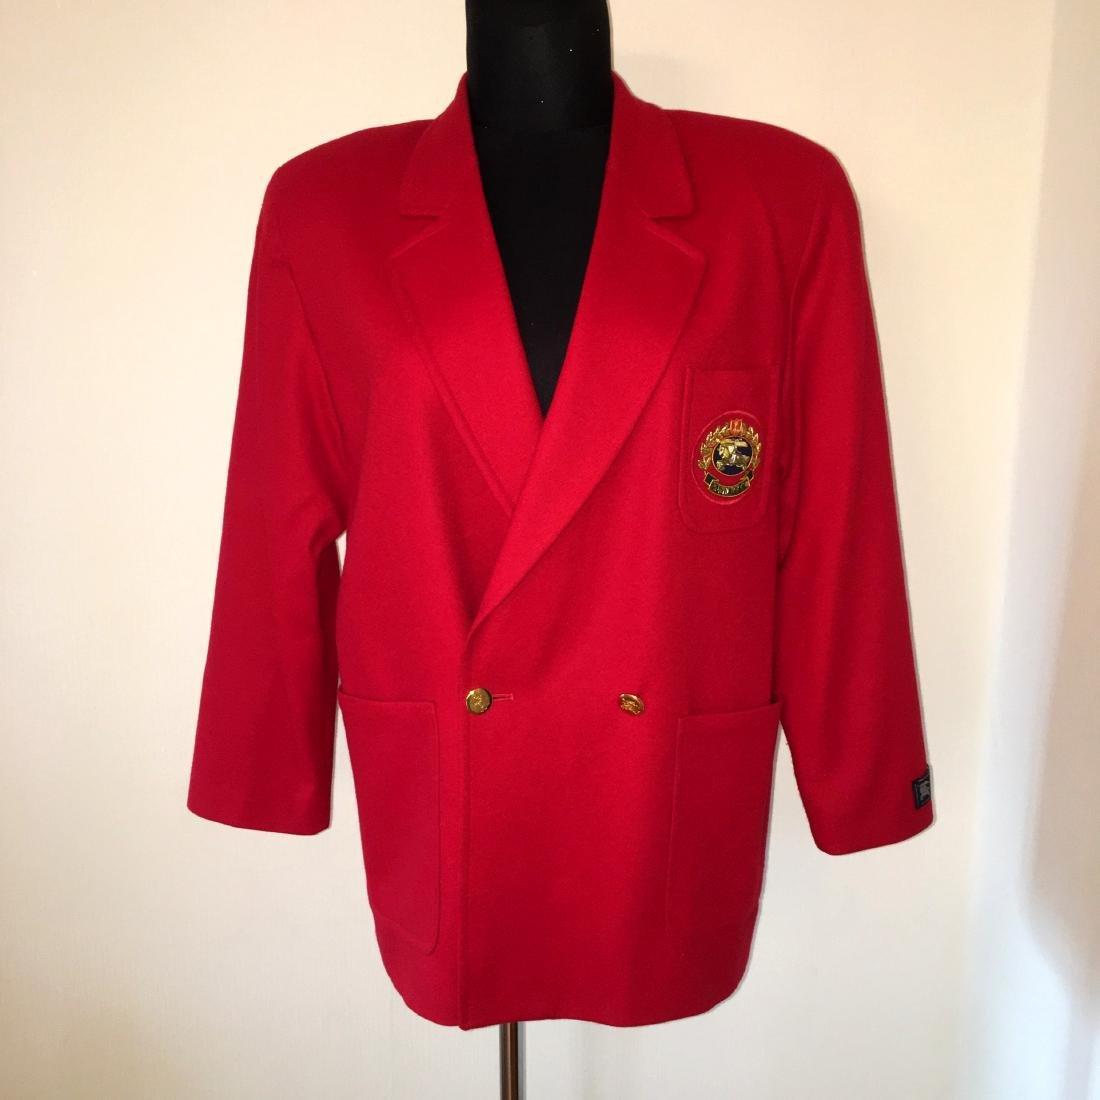 Women's Burberry Vintage 100% Wool Red Jacket Blazer